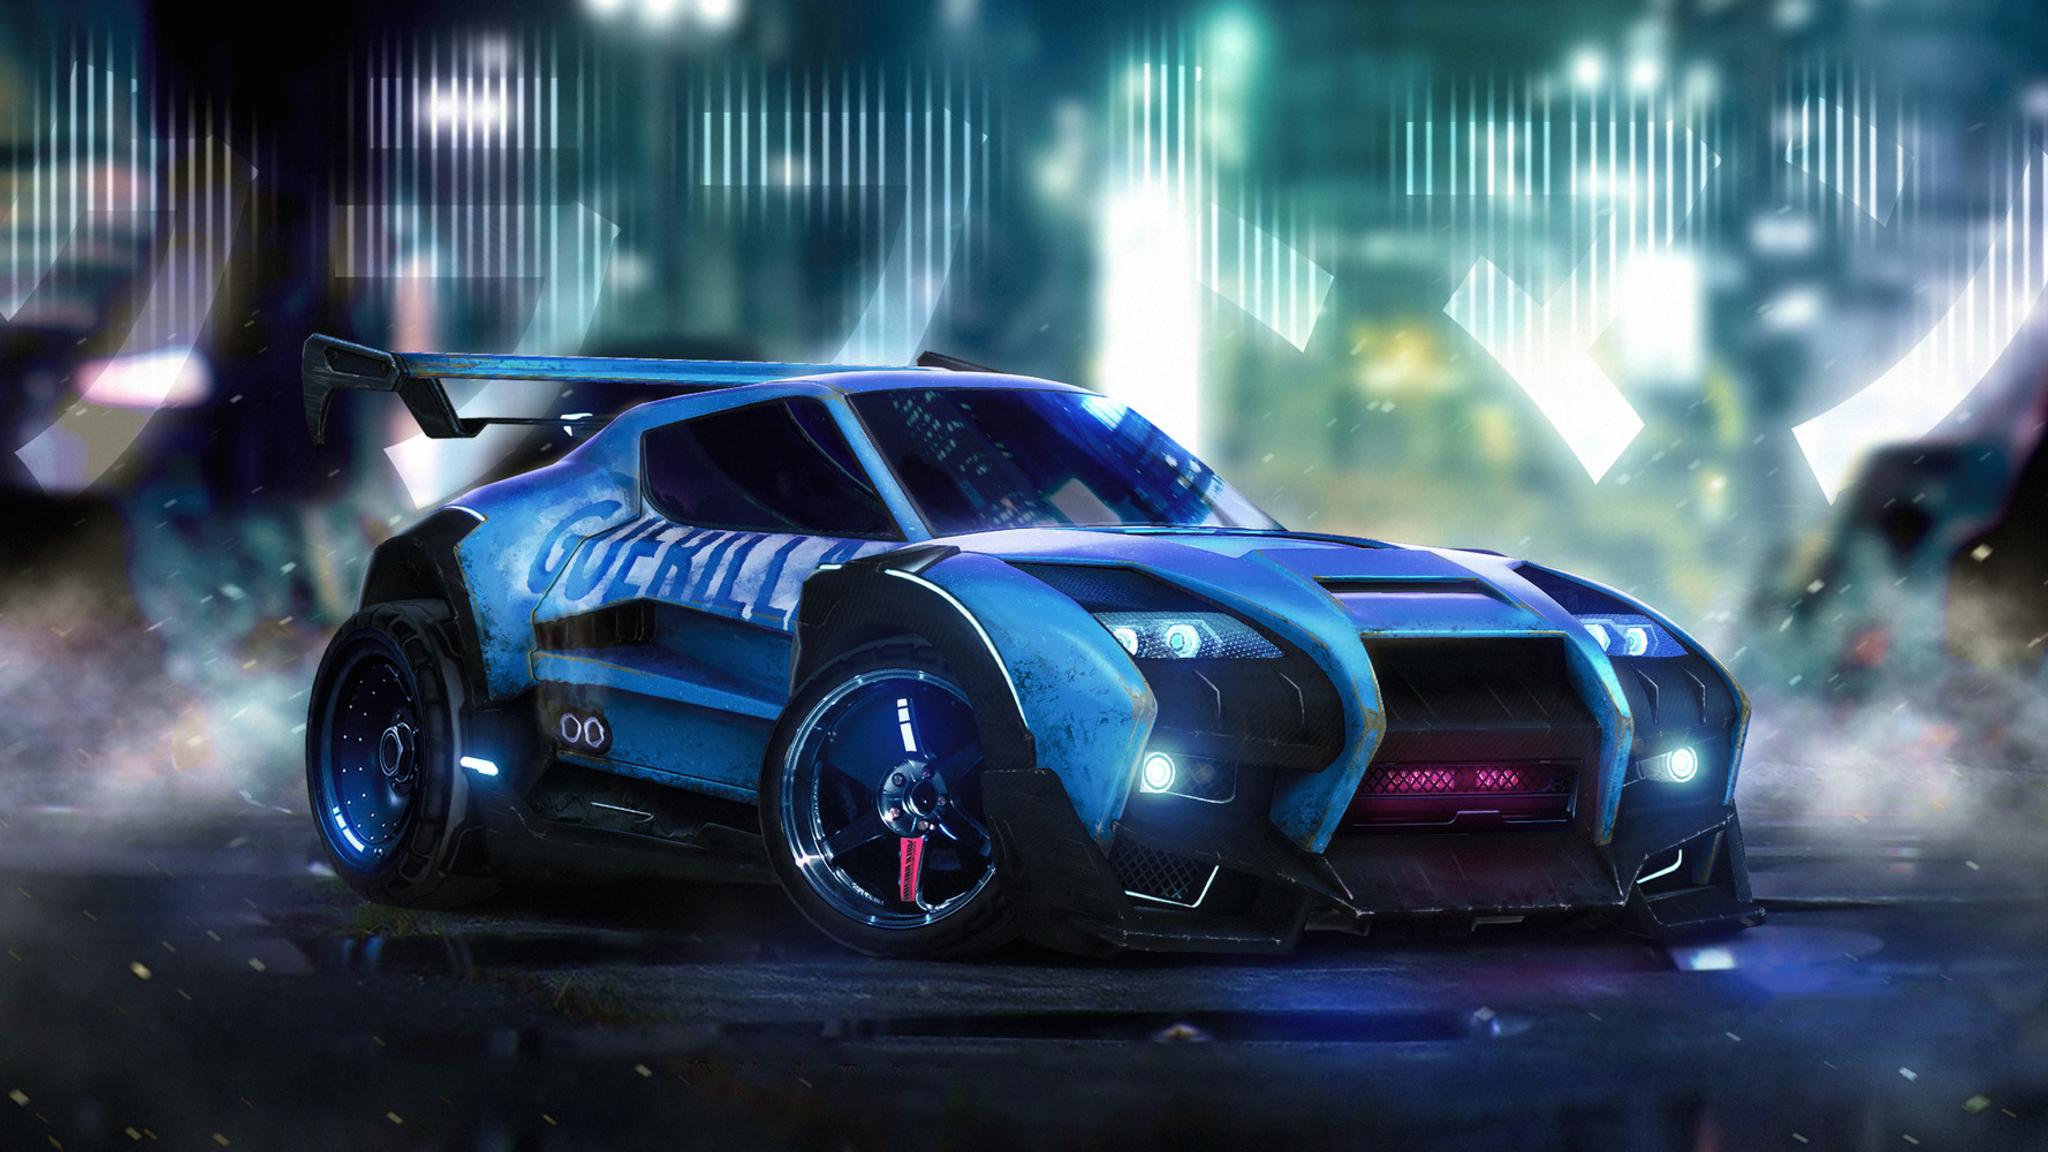 2048x1152 Rocket League Car Artwork 2048x1152 Resolution